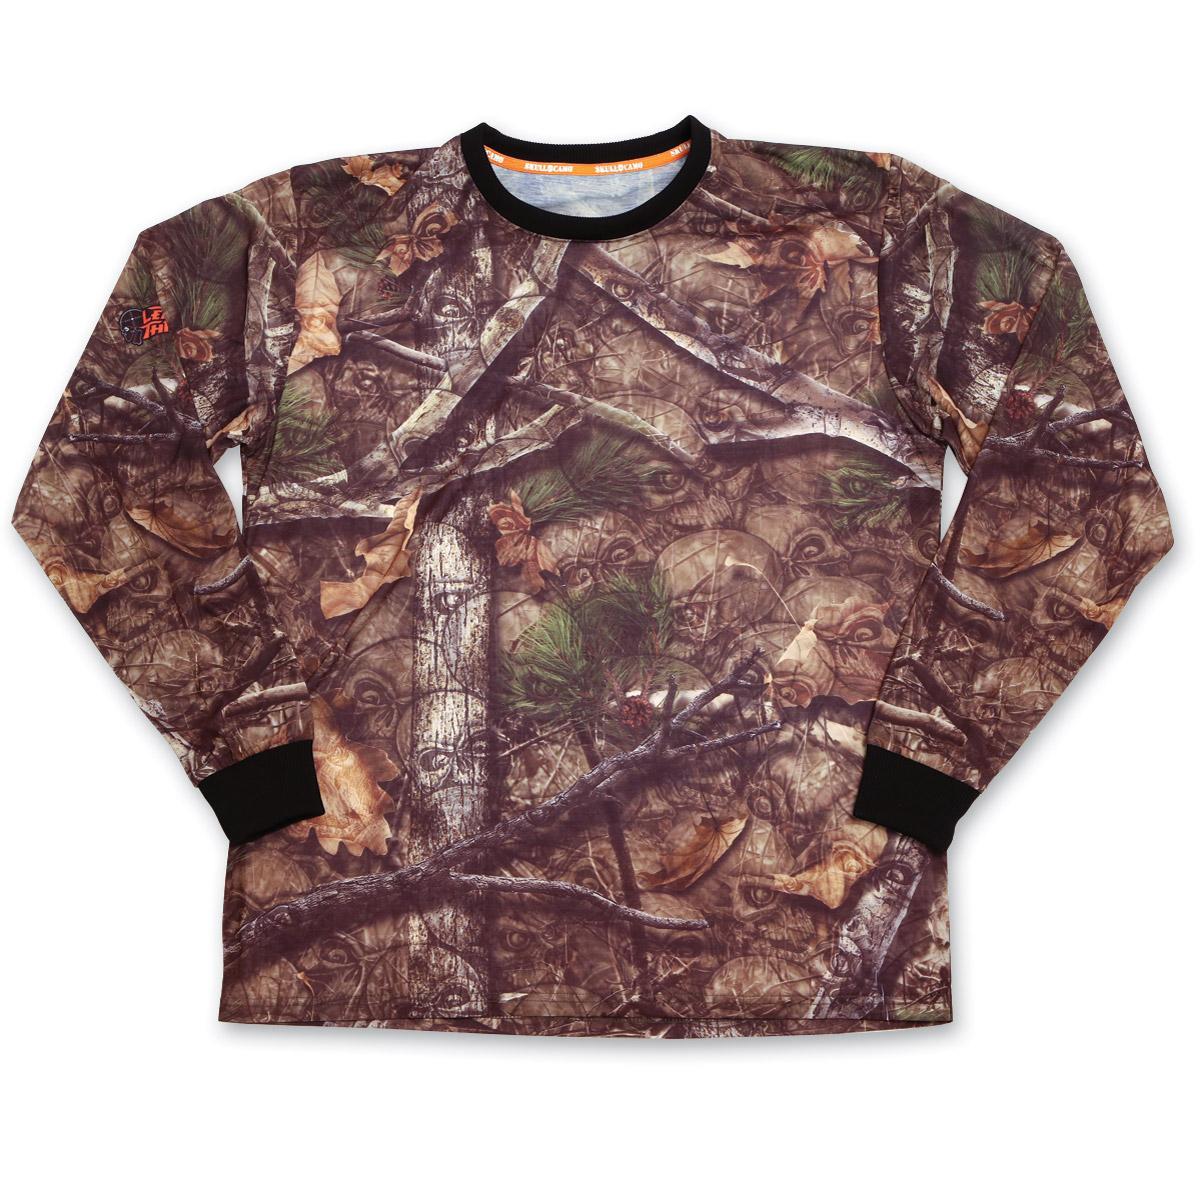 a9d27252c188 Lethal Threat Backwoods Skull Camo Long-Sleeve T-Shirt - SC50500-2X ...